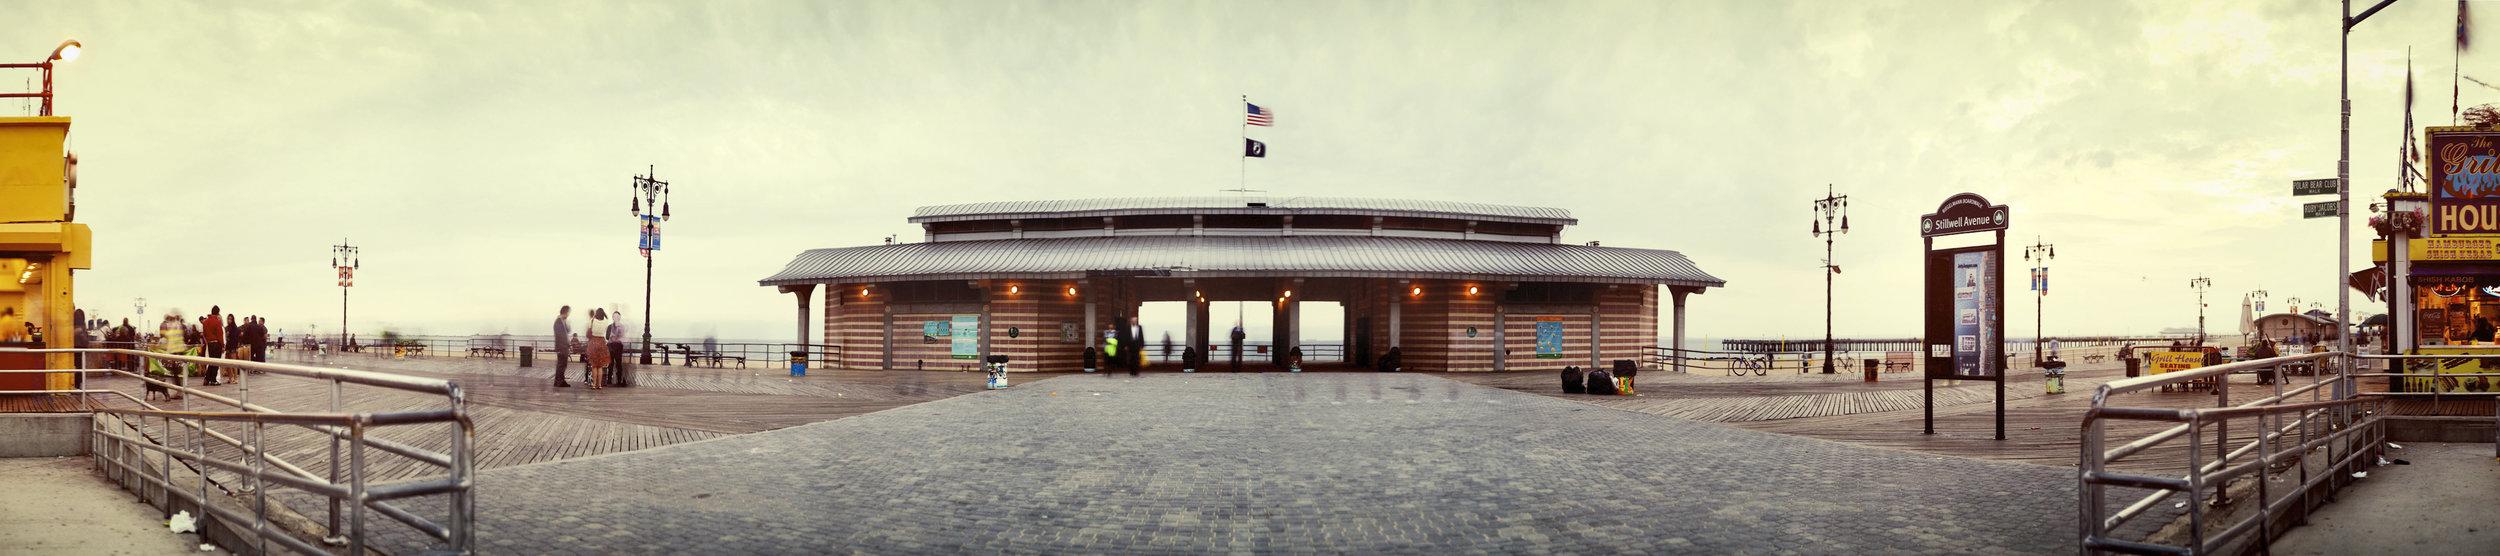 Coney Island-2.jpg